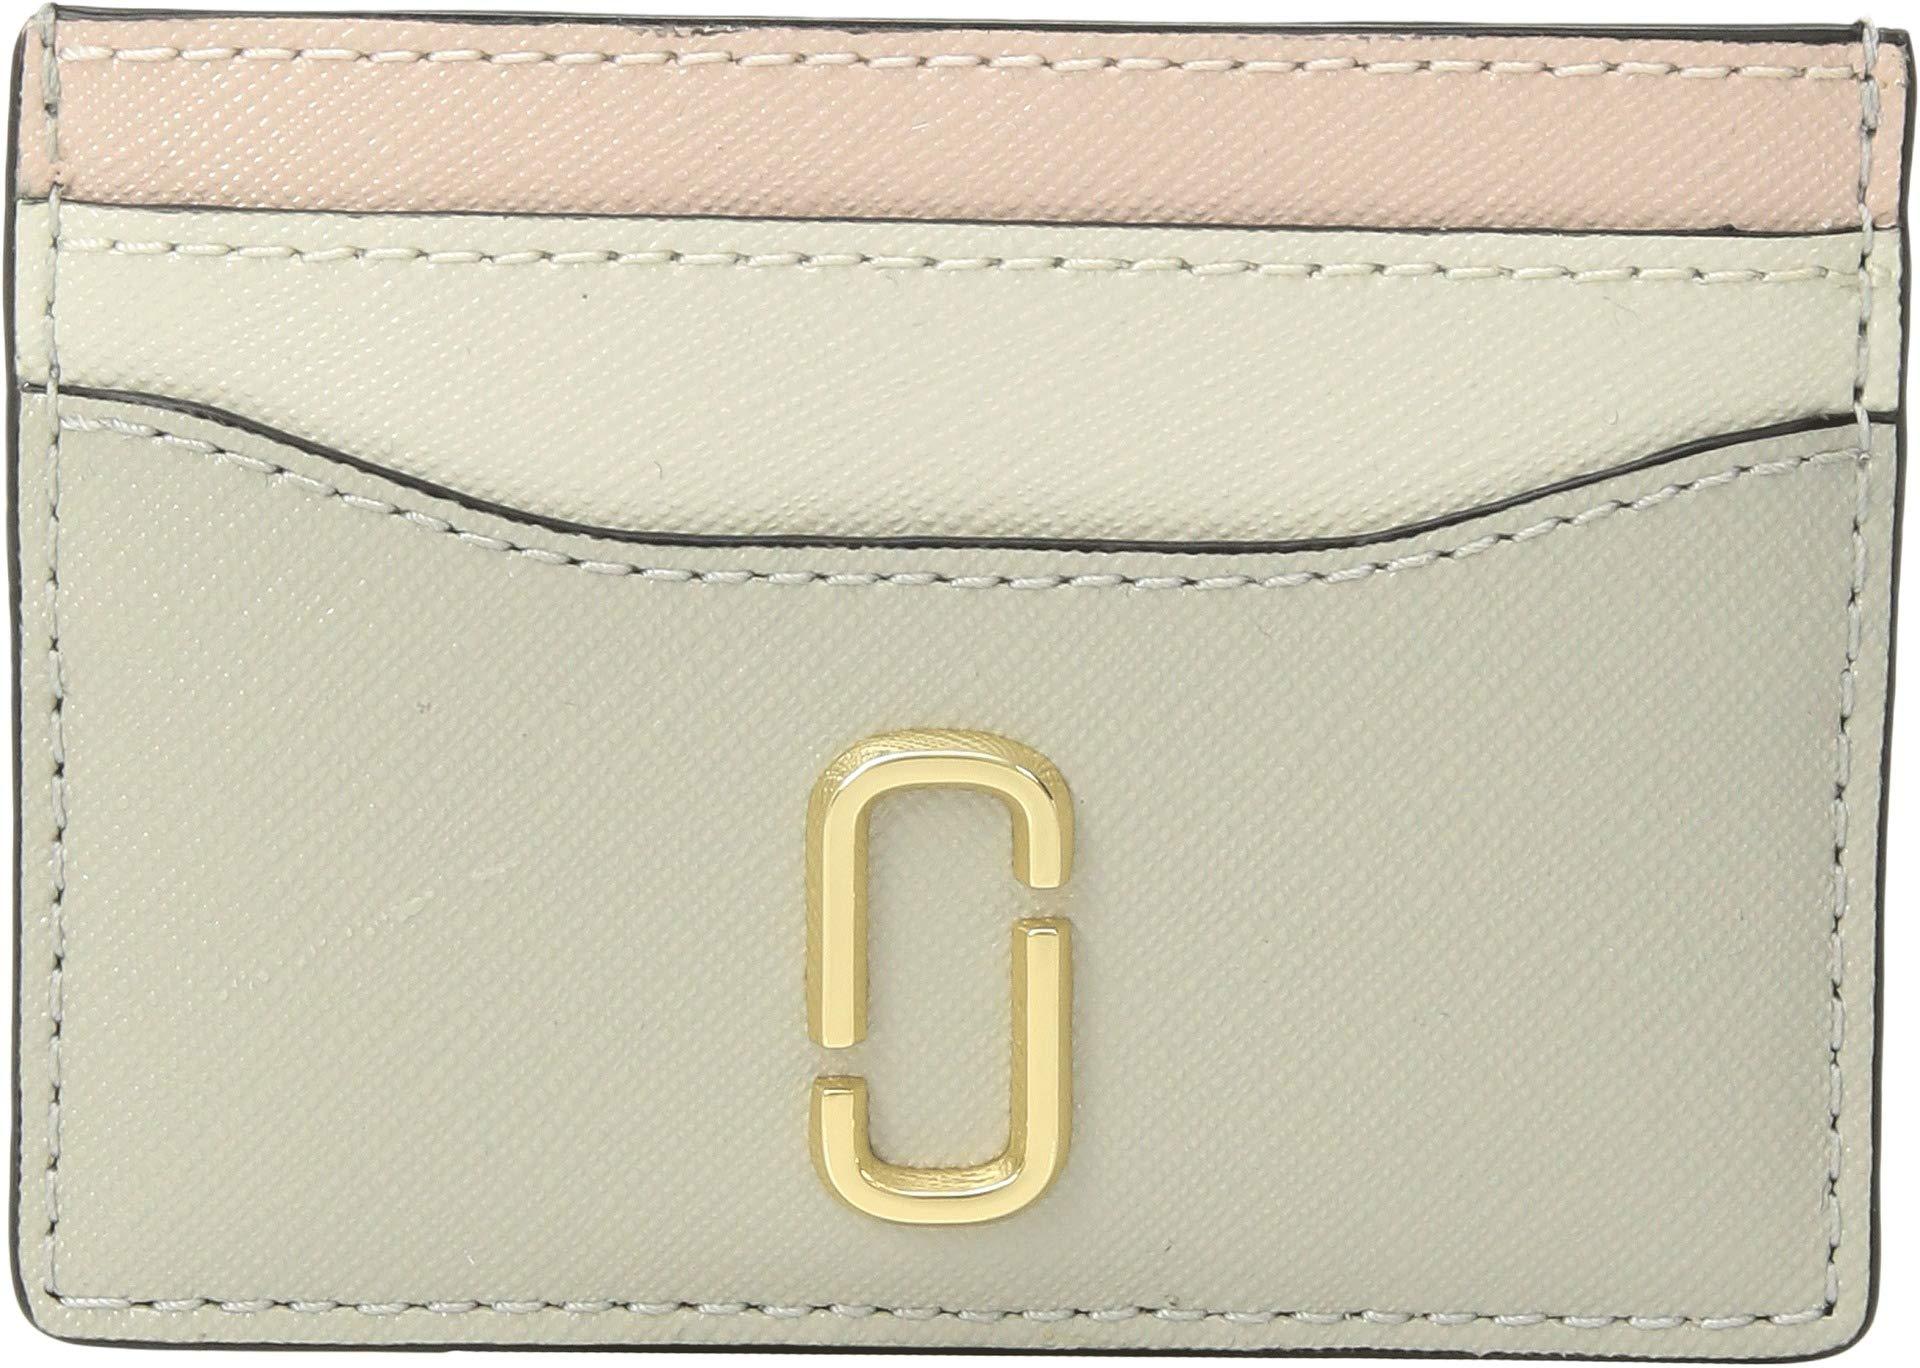 Marc Jacobs Women's Snapshot Card Case, Dust Multi, One Size